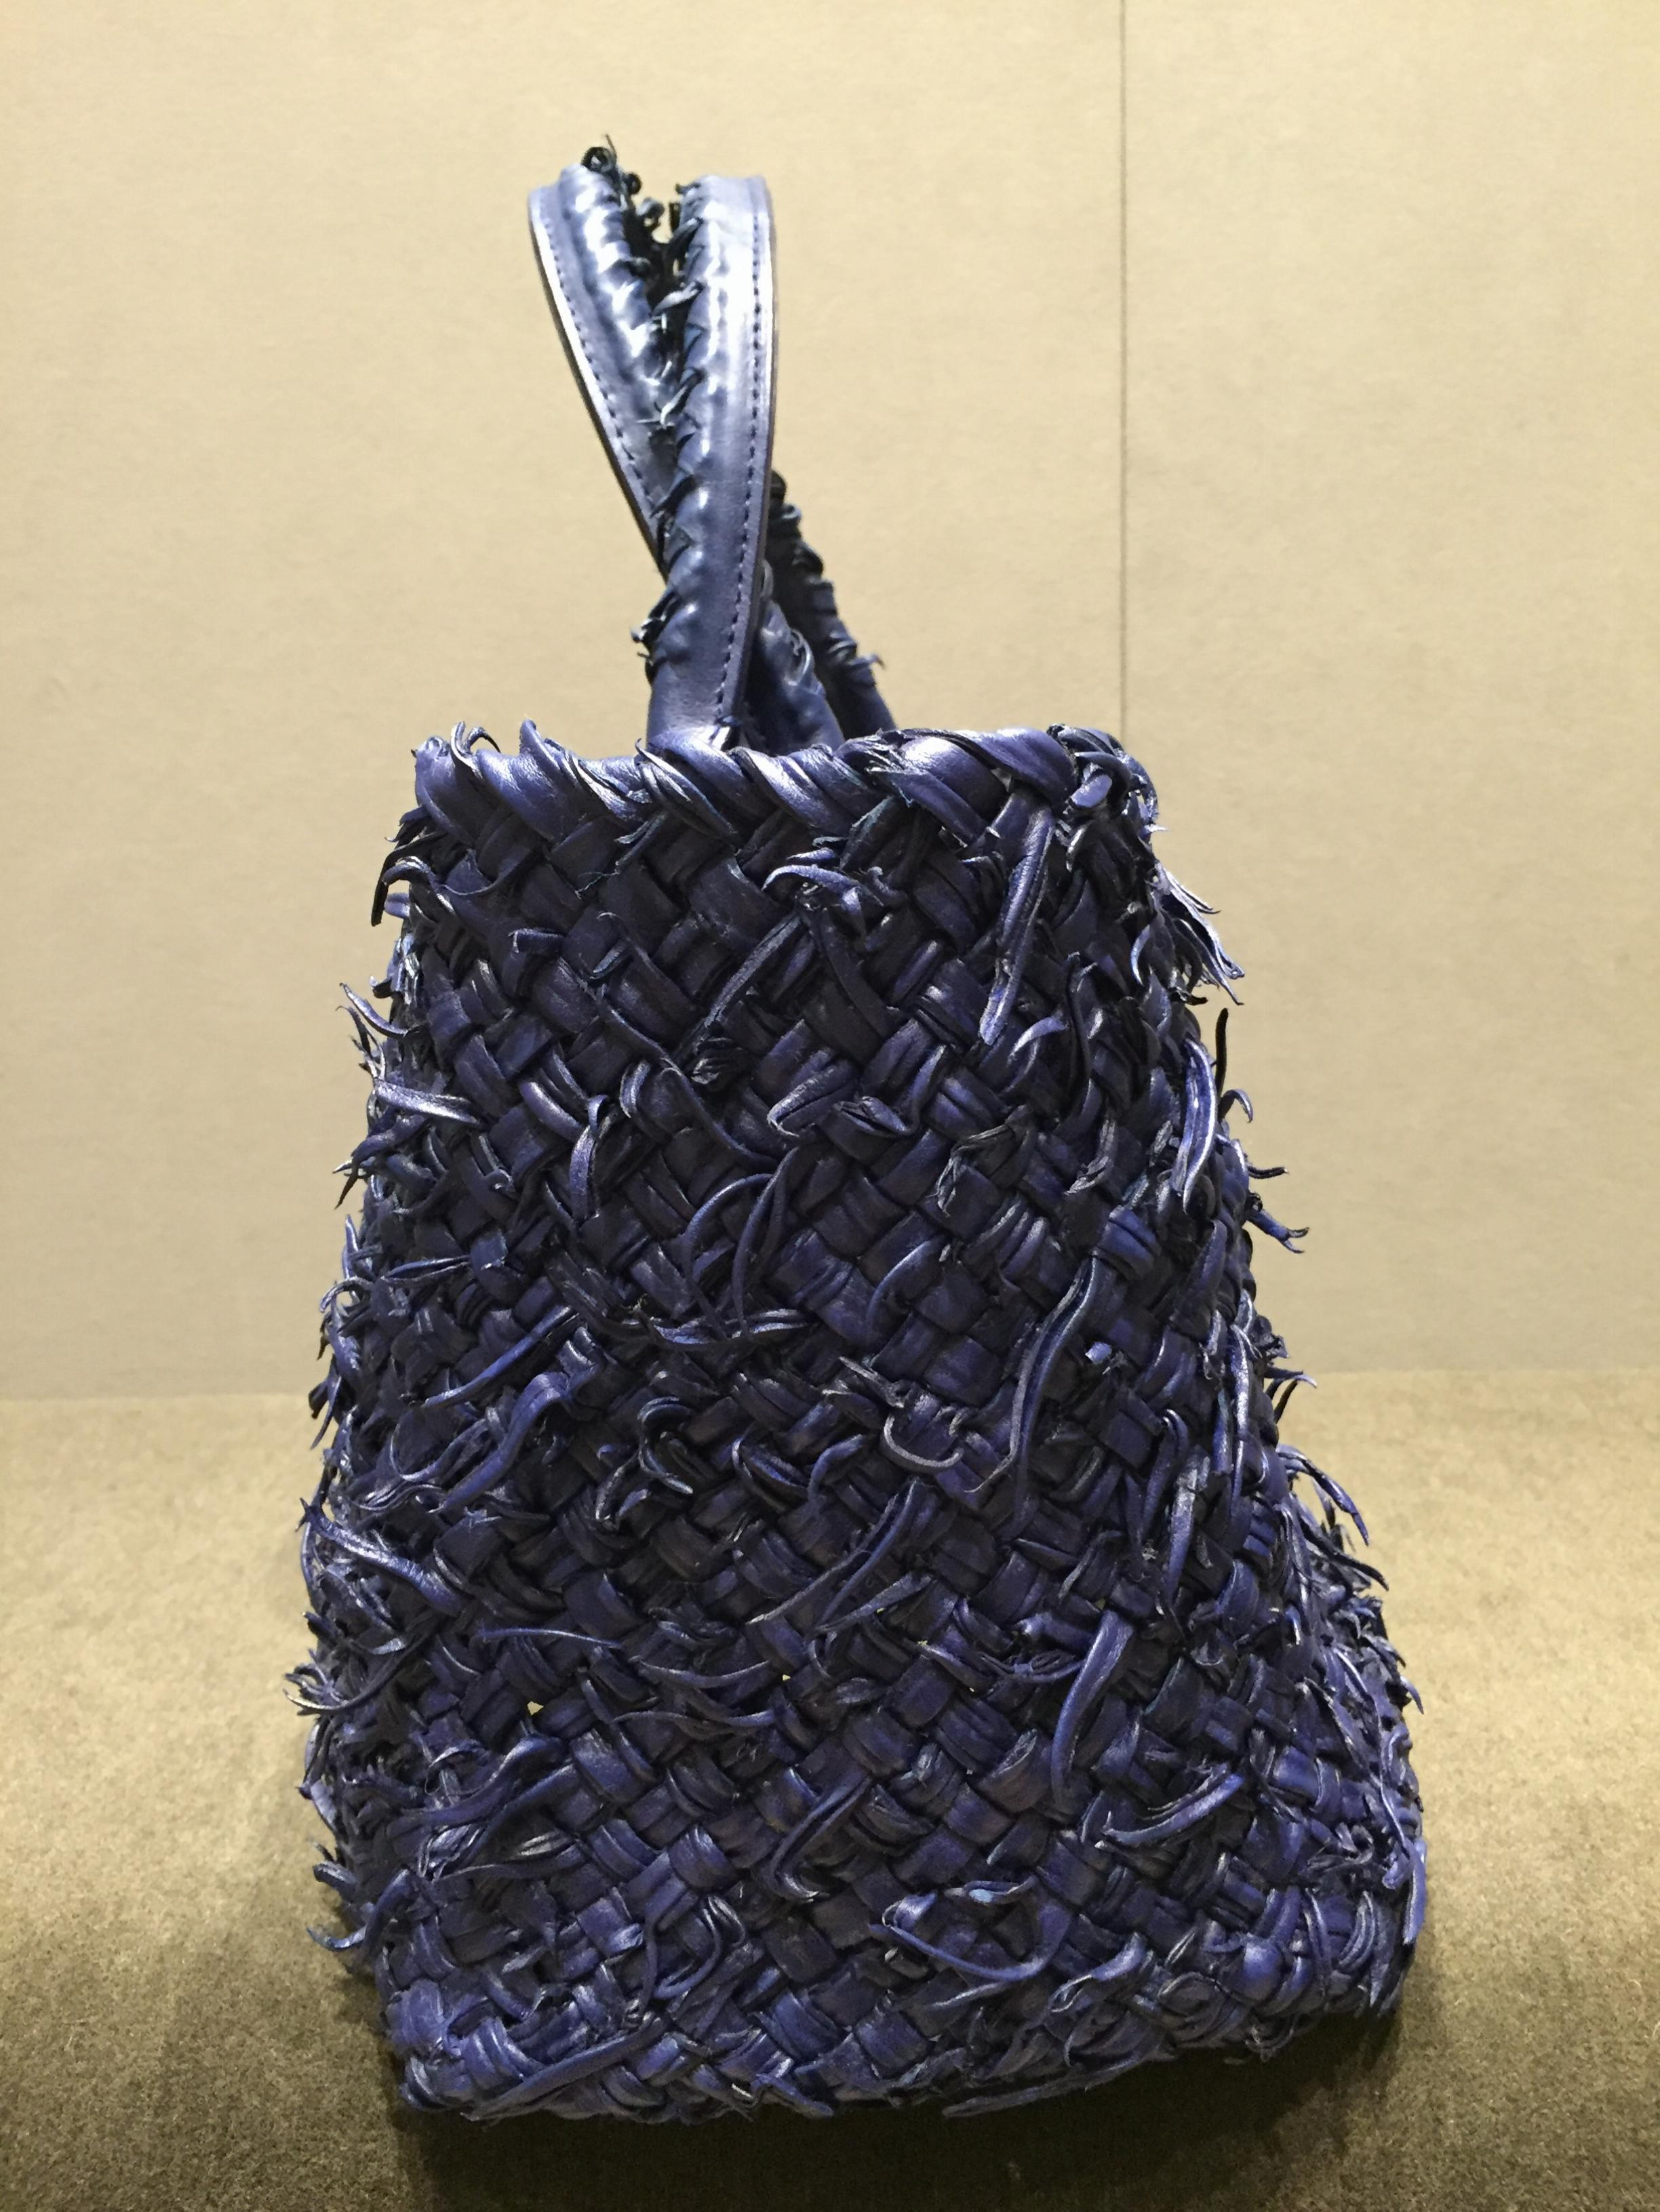 e3e9e1dda291 Bottega Veneta Limited Edition Sapphire Cabat Fuzzy Bag. 22. 1234567